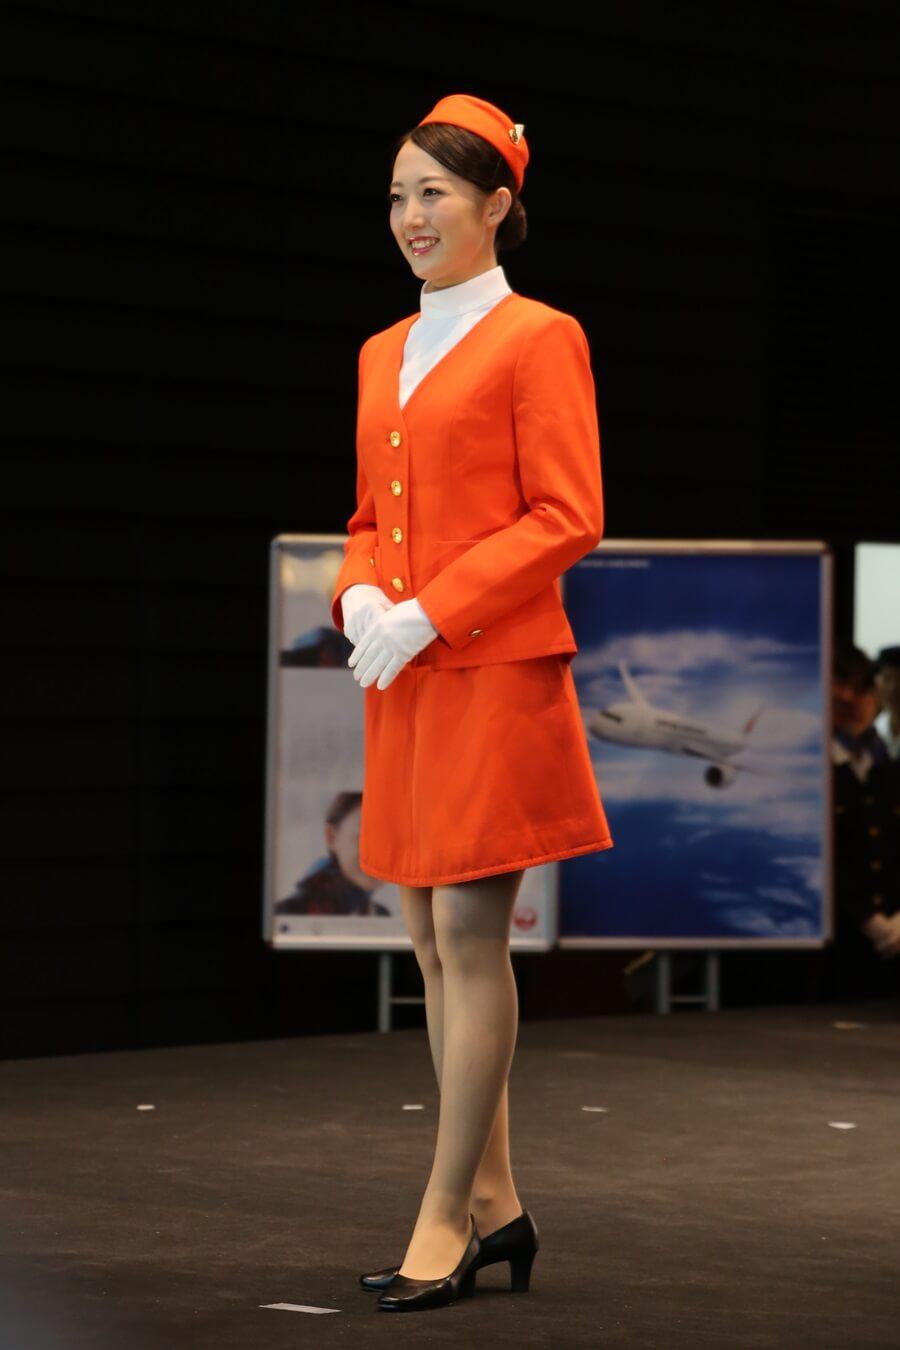 JAS2代目制服 JALとJEX客室乗務員歴代制服ファッションショー 客室乗務員 スチワーデス 歴代ユニフォーム 制服 空の日フェスティバル JAL fashion show JAS (3)